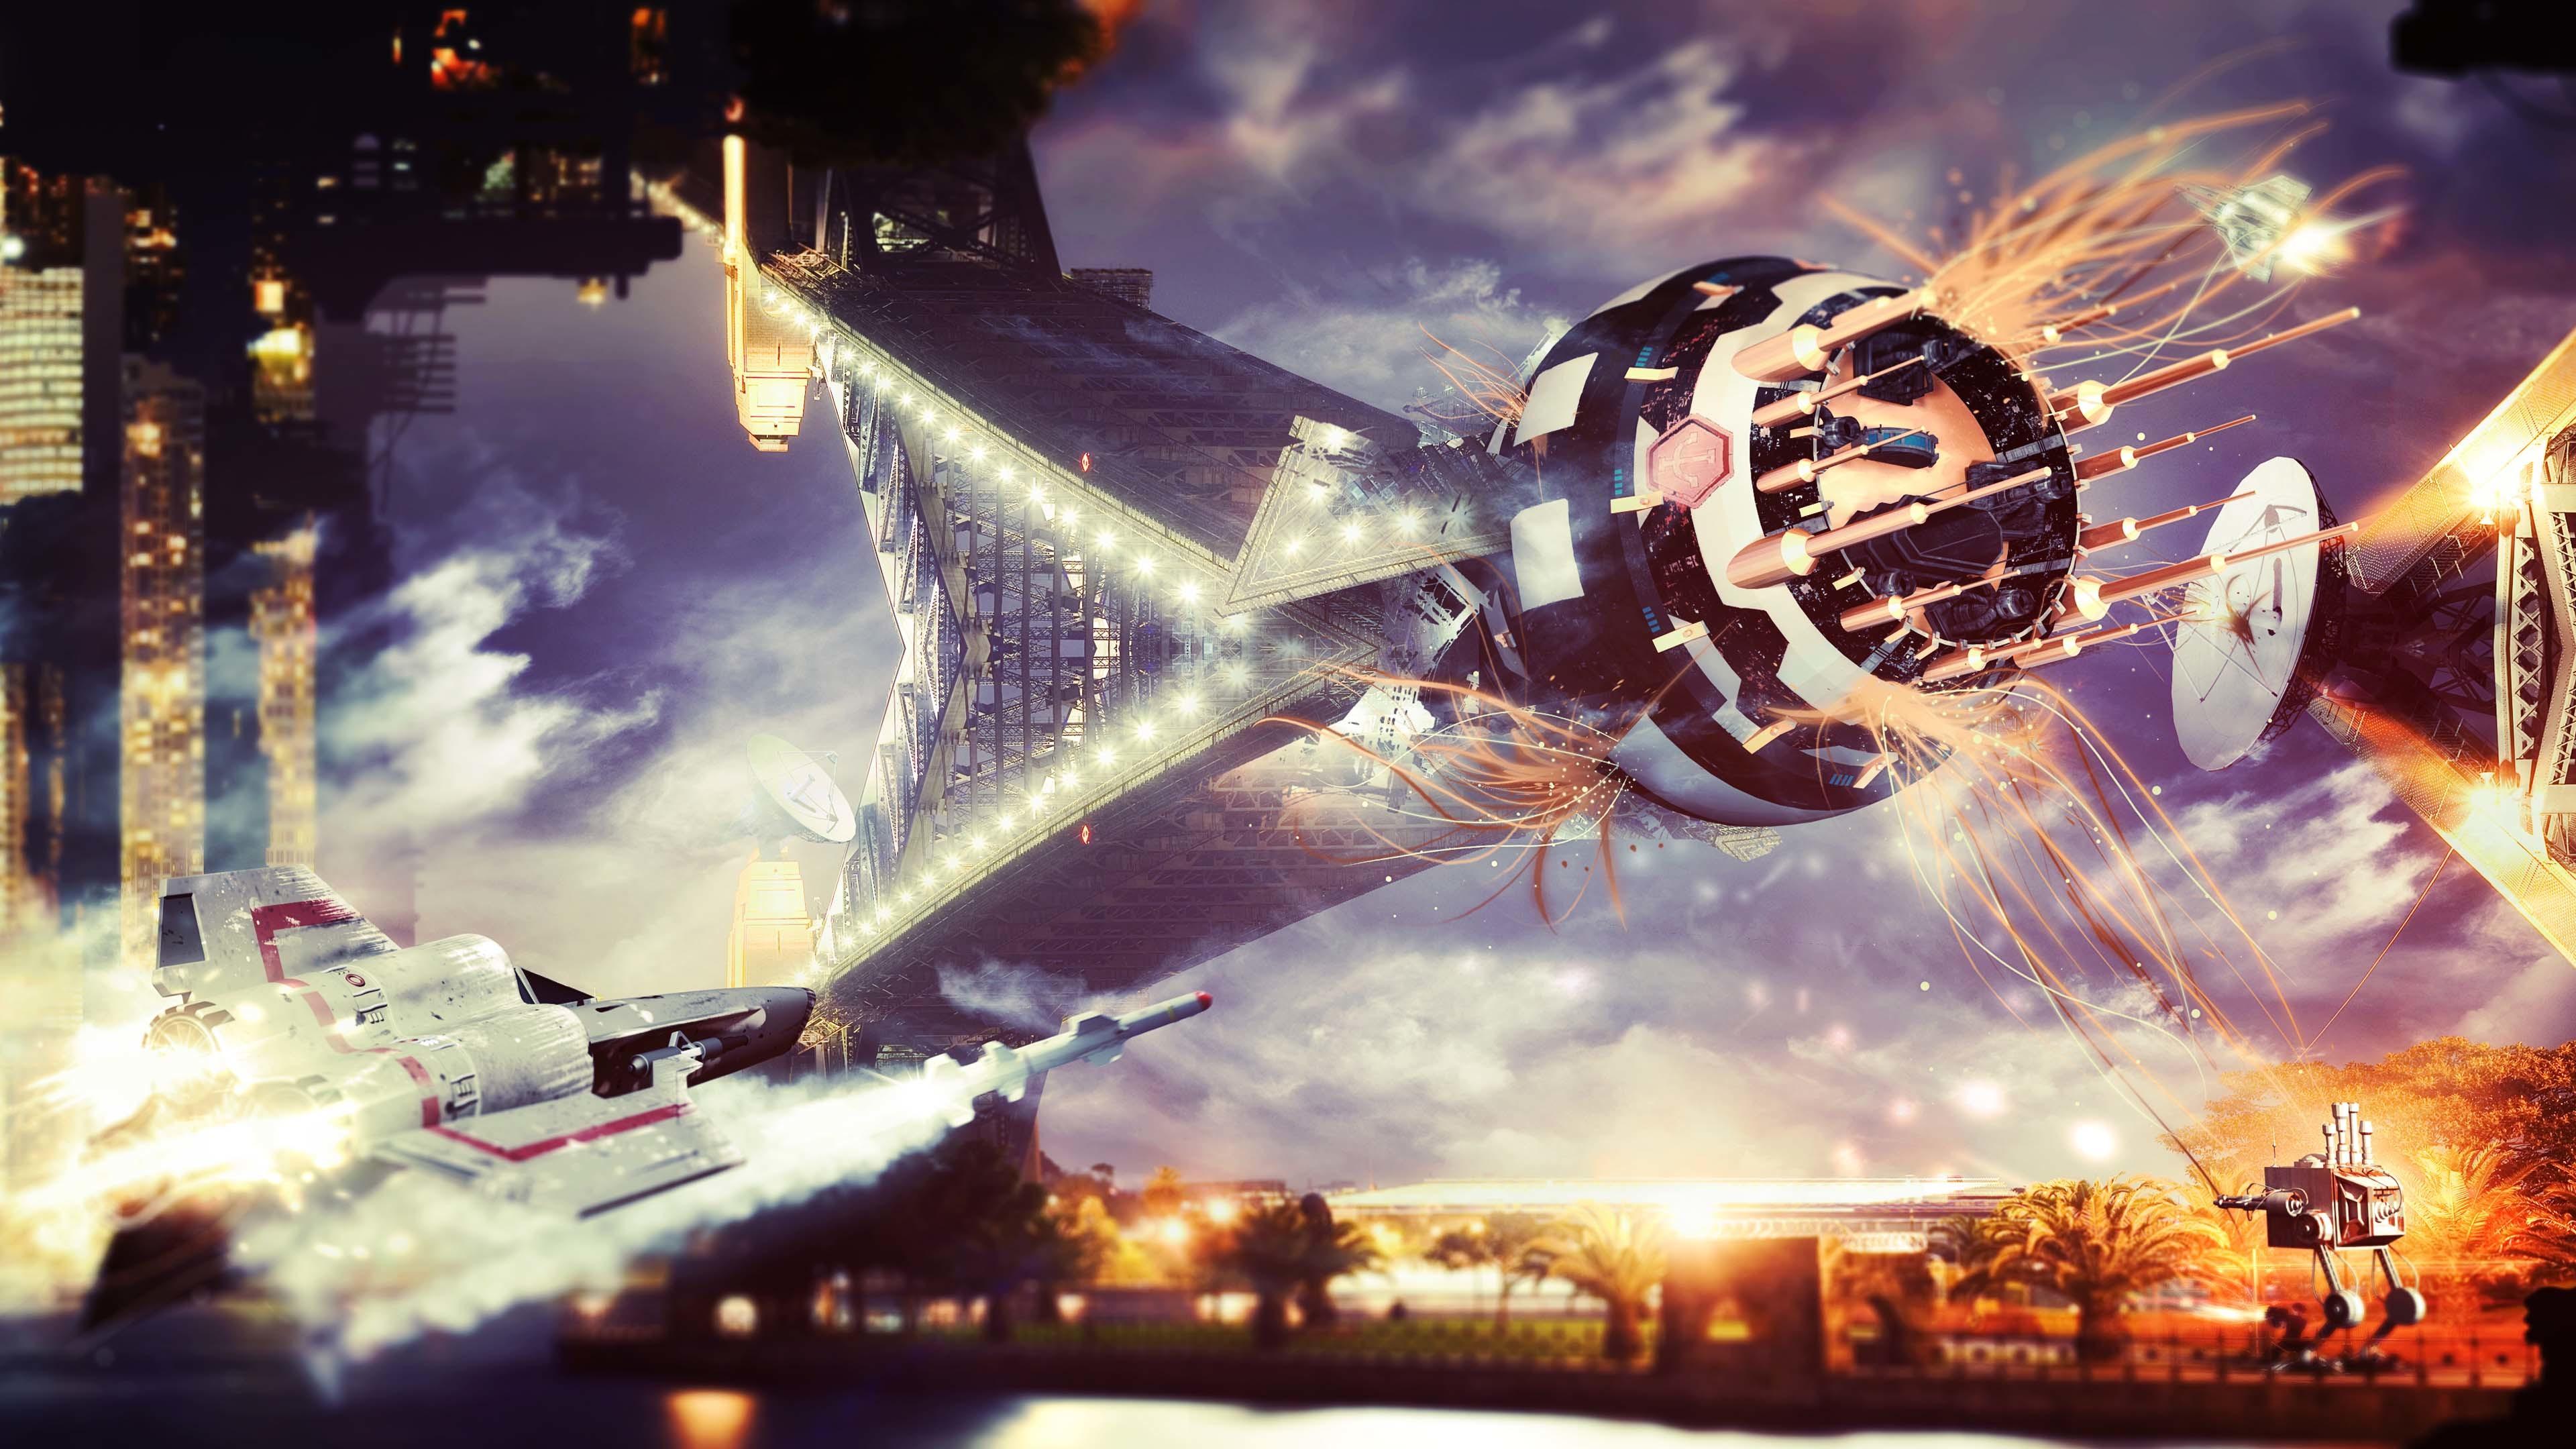 Science Fiction Wallpapers Sci Fi Wallpapers 2 Desktop: 4K Sci Fi Wallpaper (47+ Images